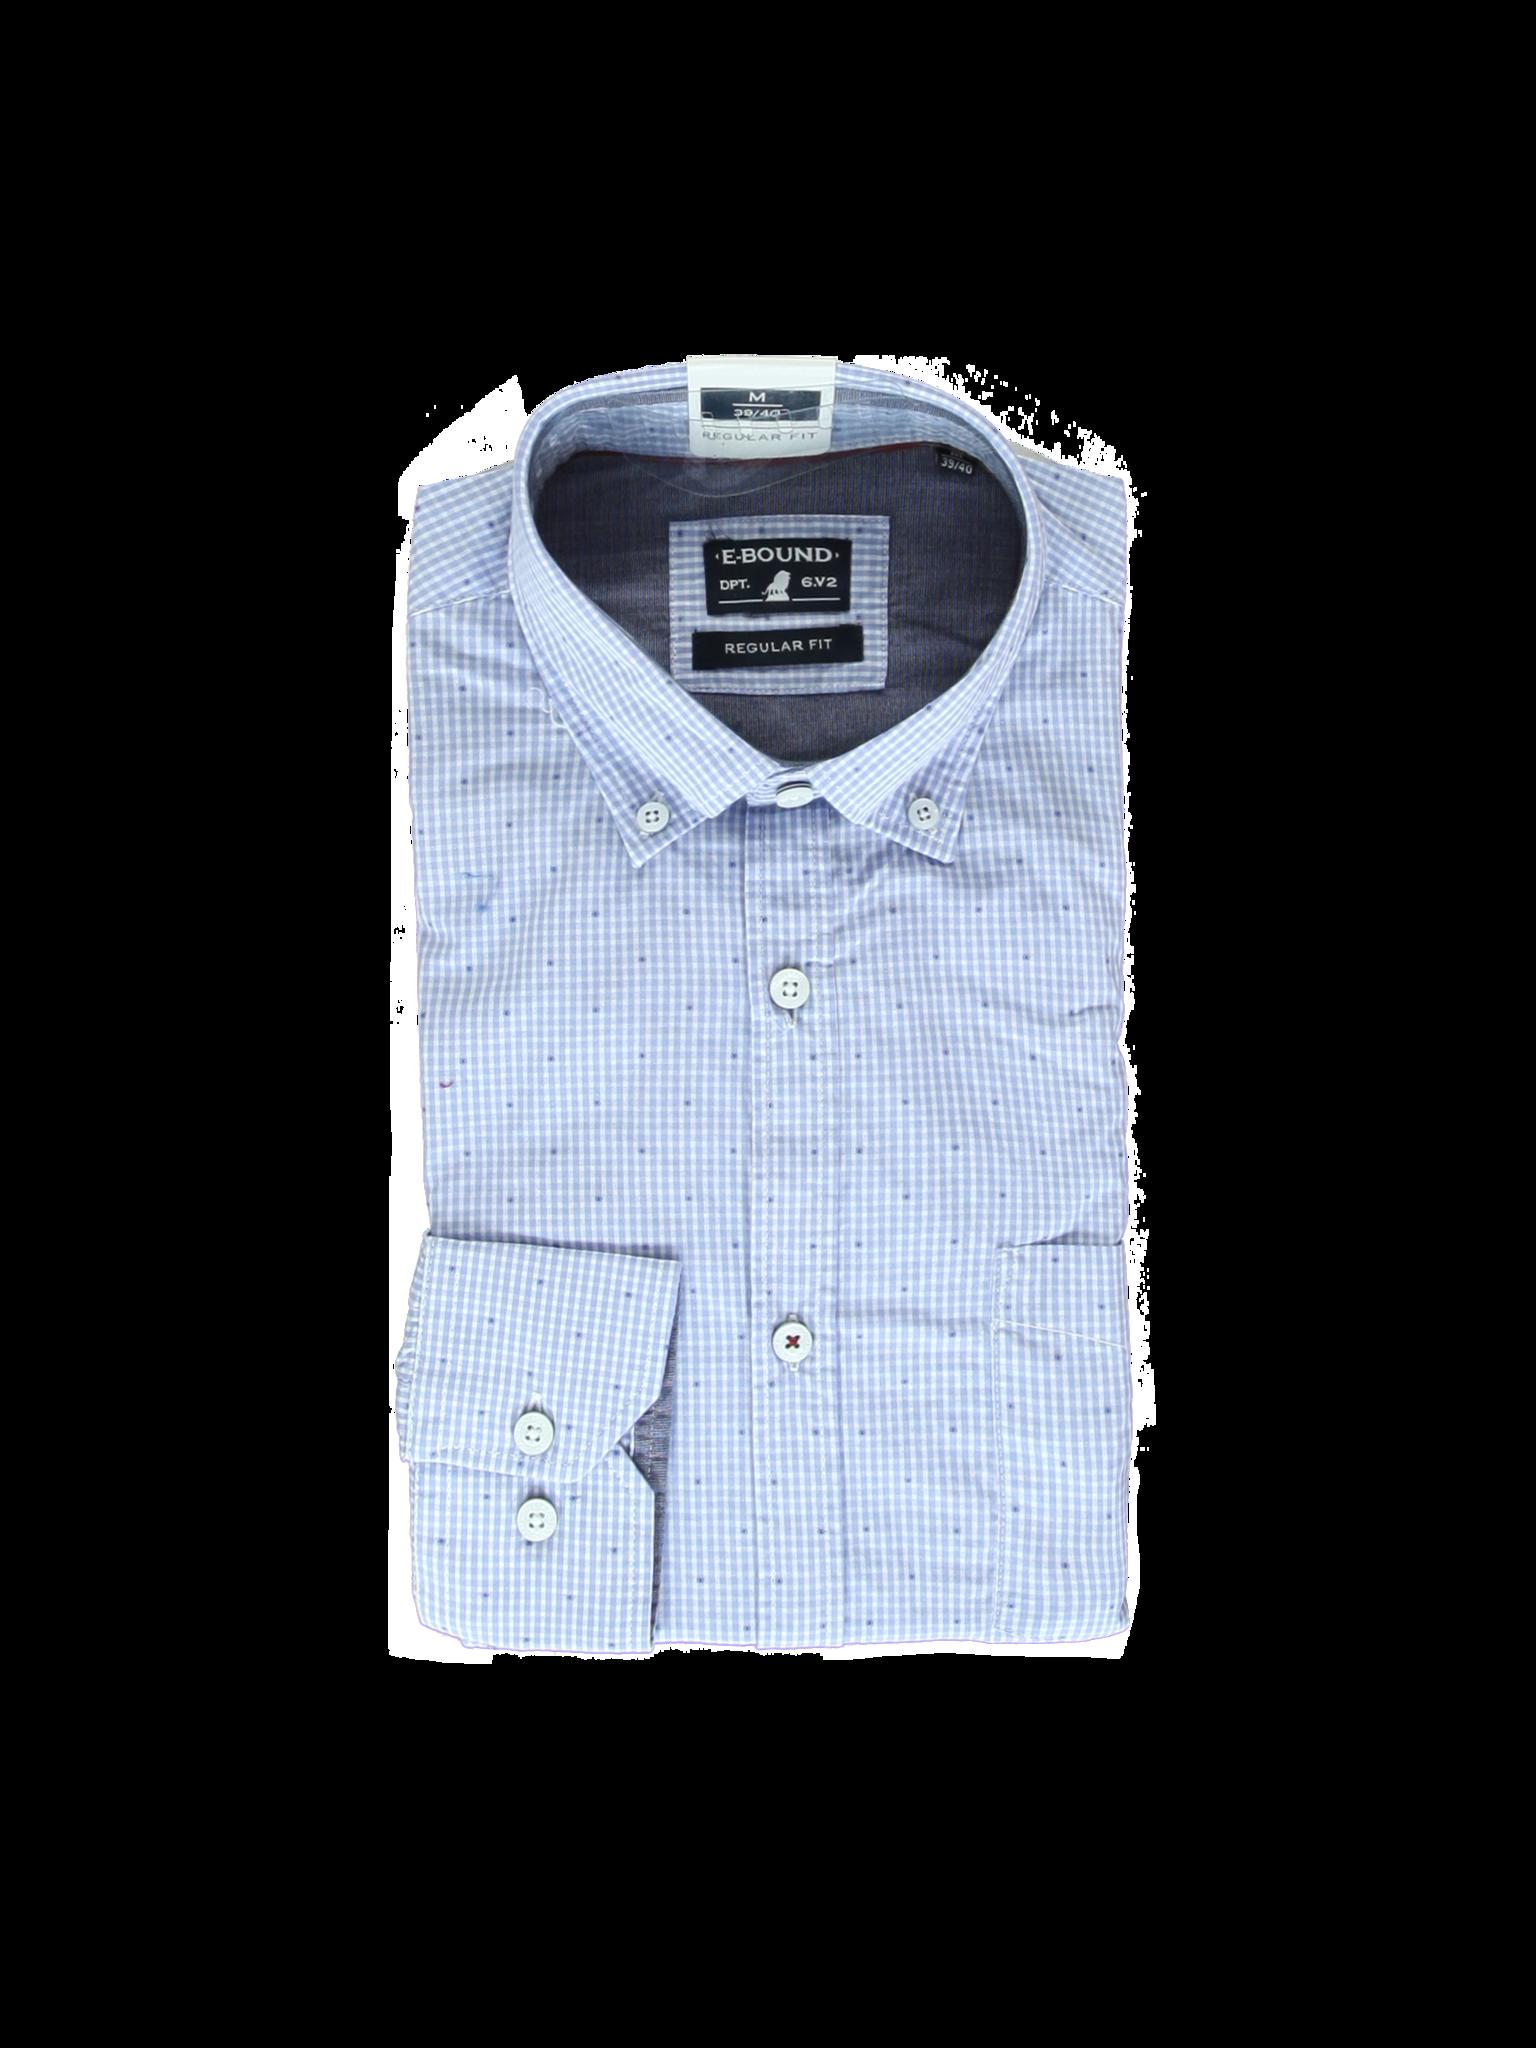 All Brands | Winterproducts Men | Shirt | 15 pcs/box